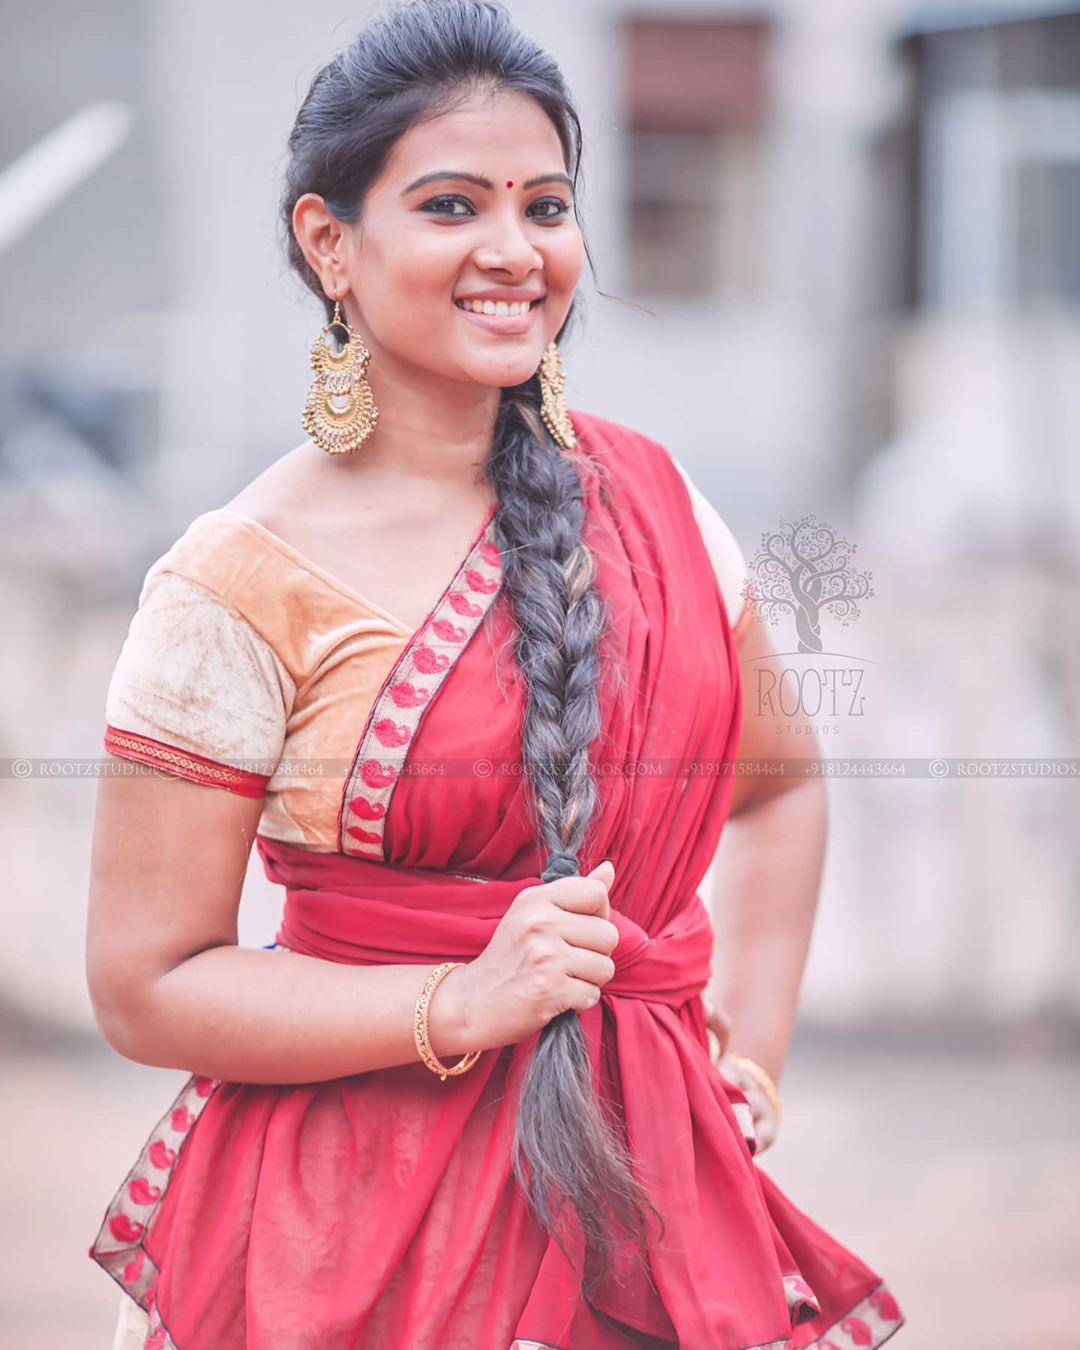 dhivya dhuraisamy homely saree photos (18)